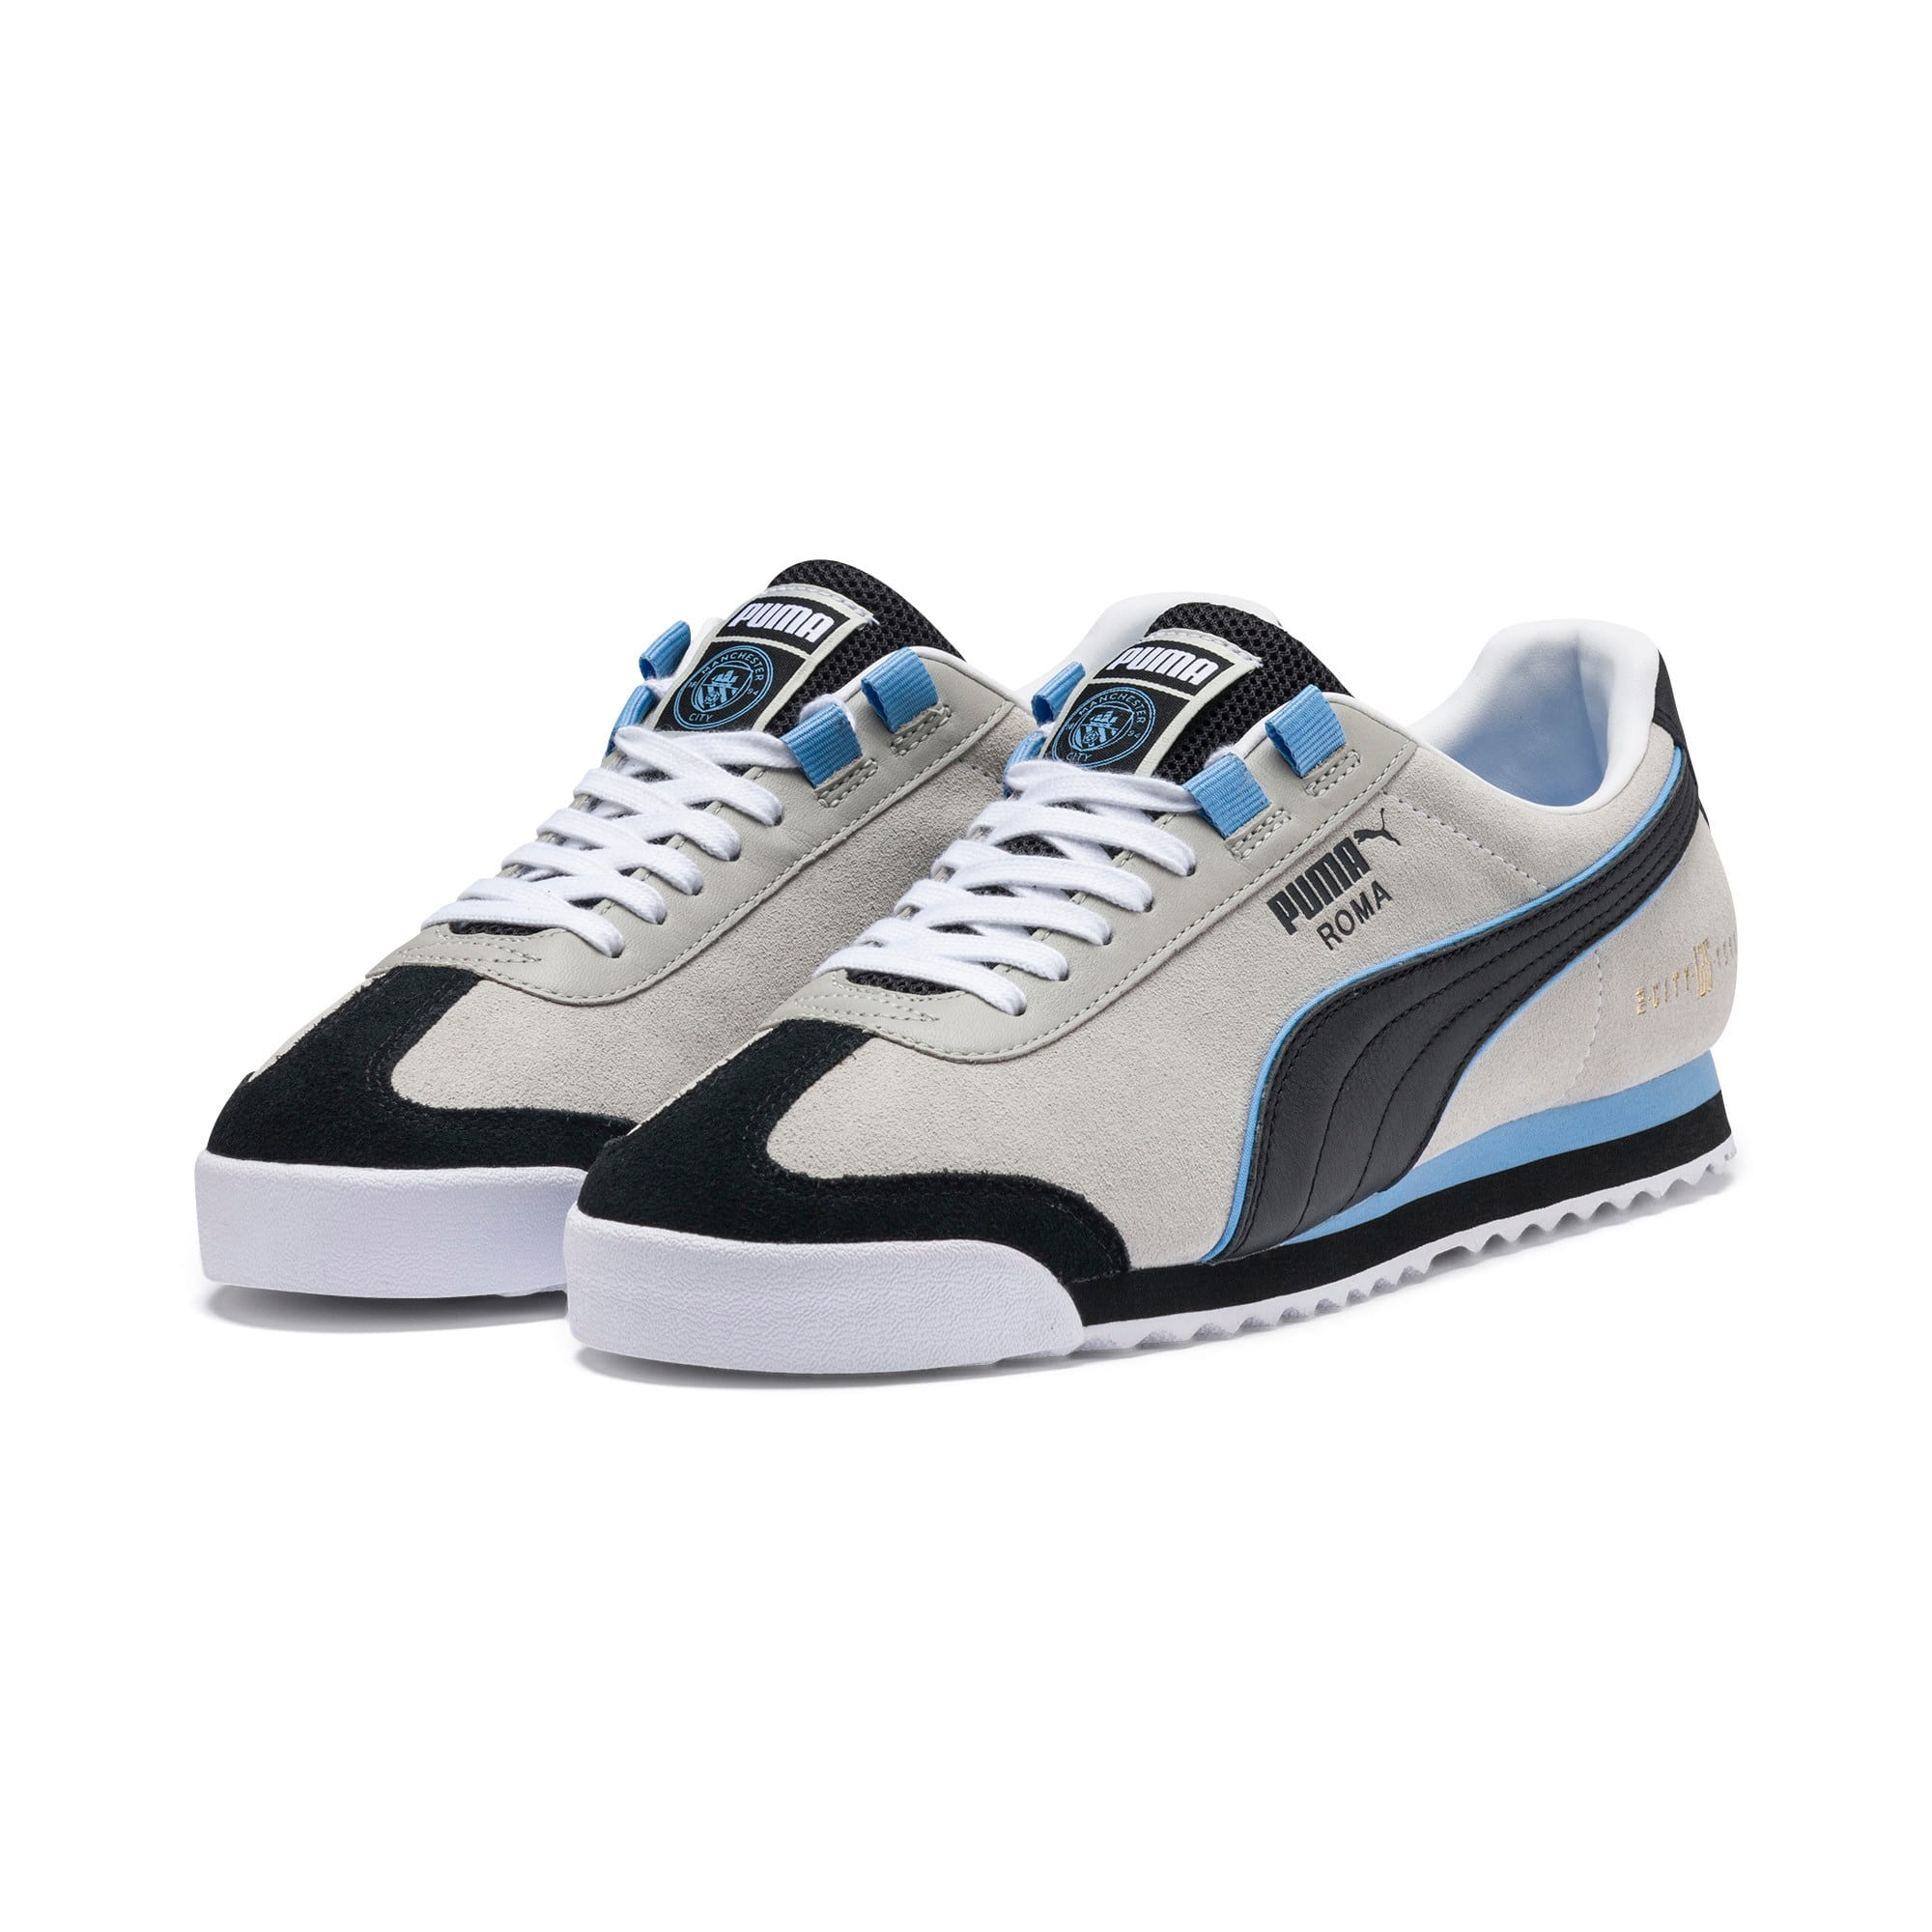 Thumbnail 2 of Roma Manchester City Men's Sneakers, Gray Violet-Team Light Blue, medium